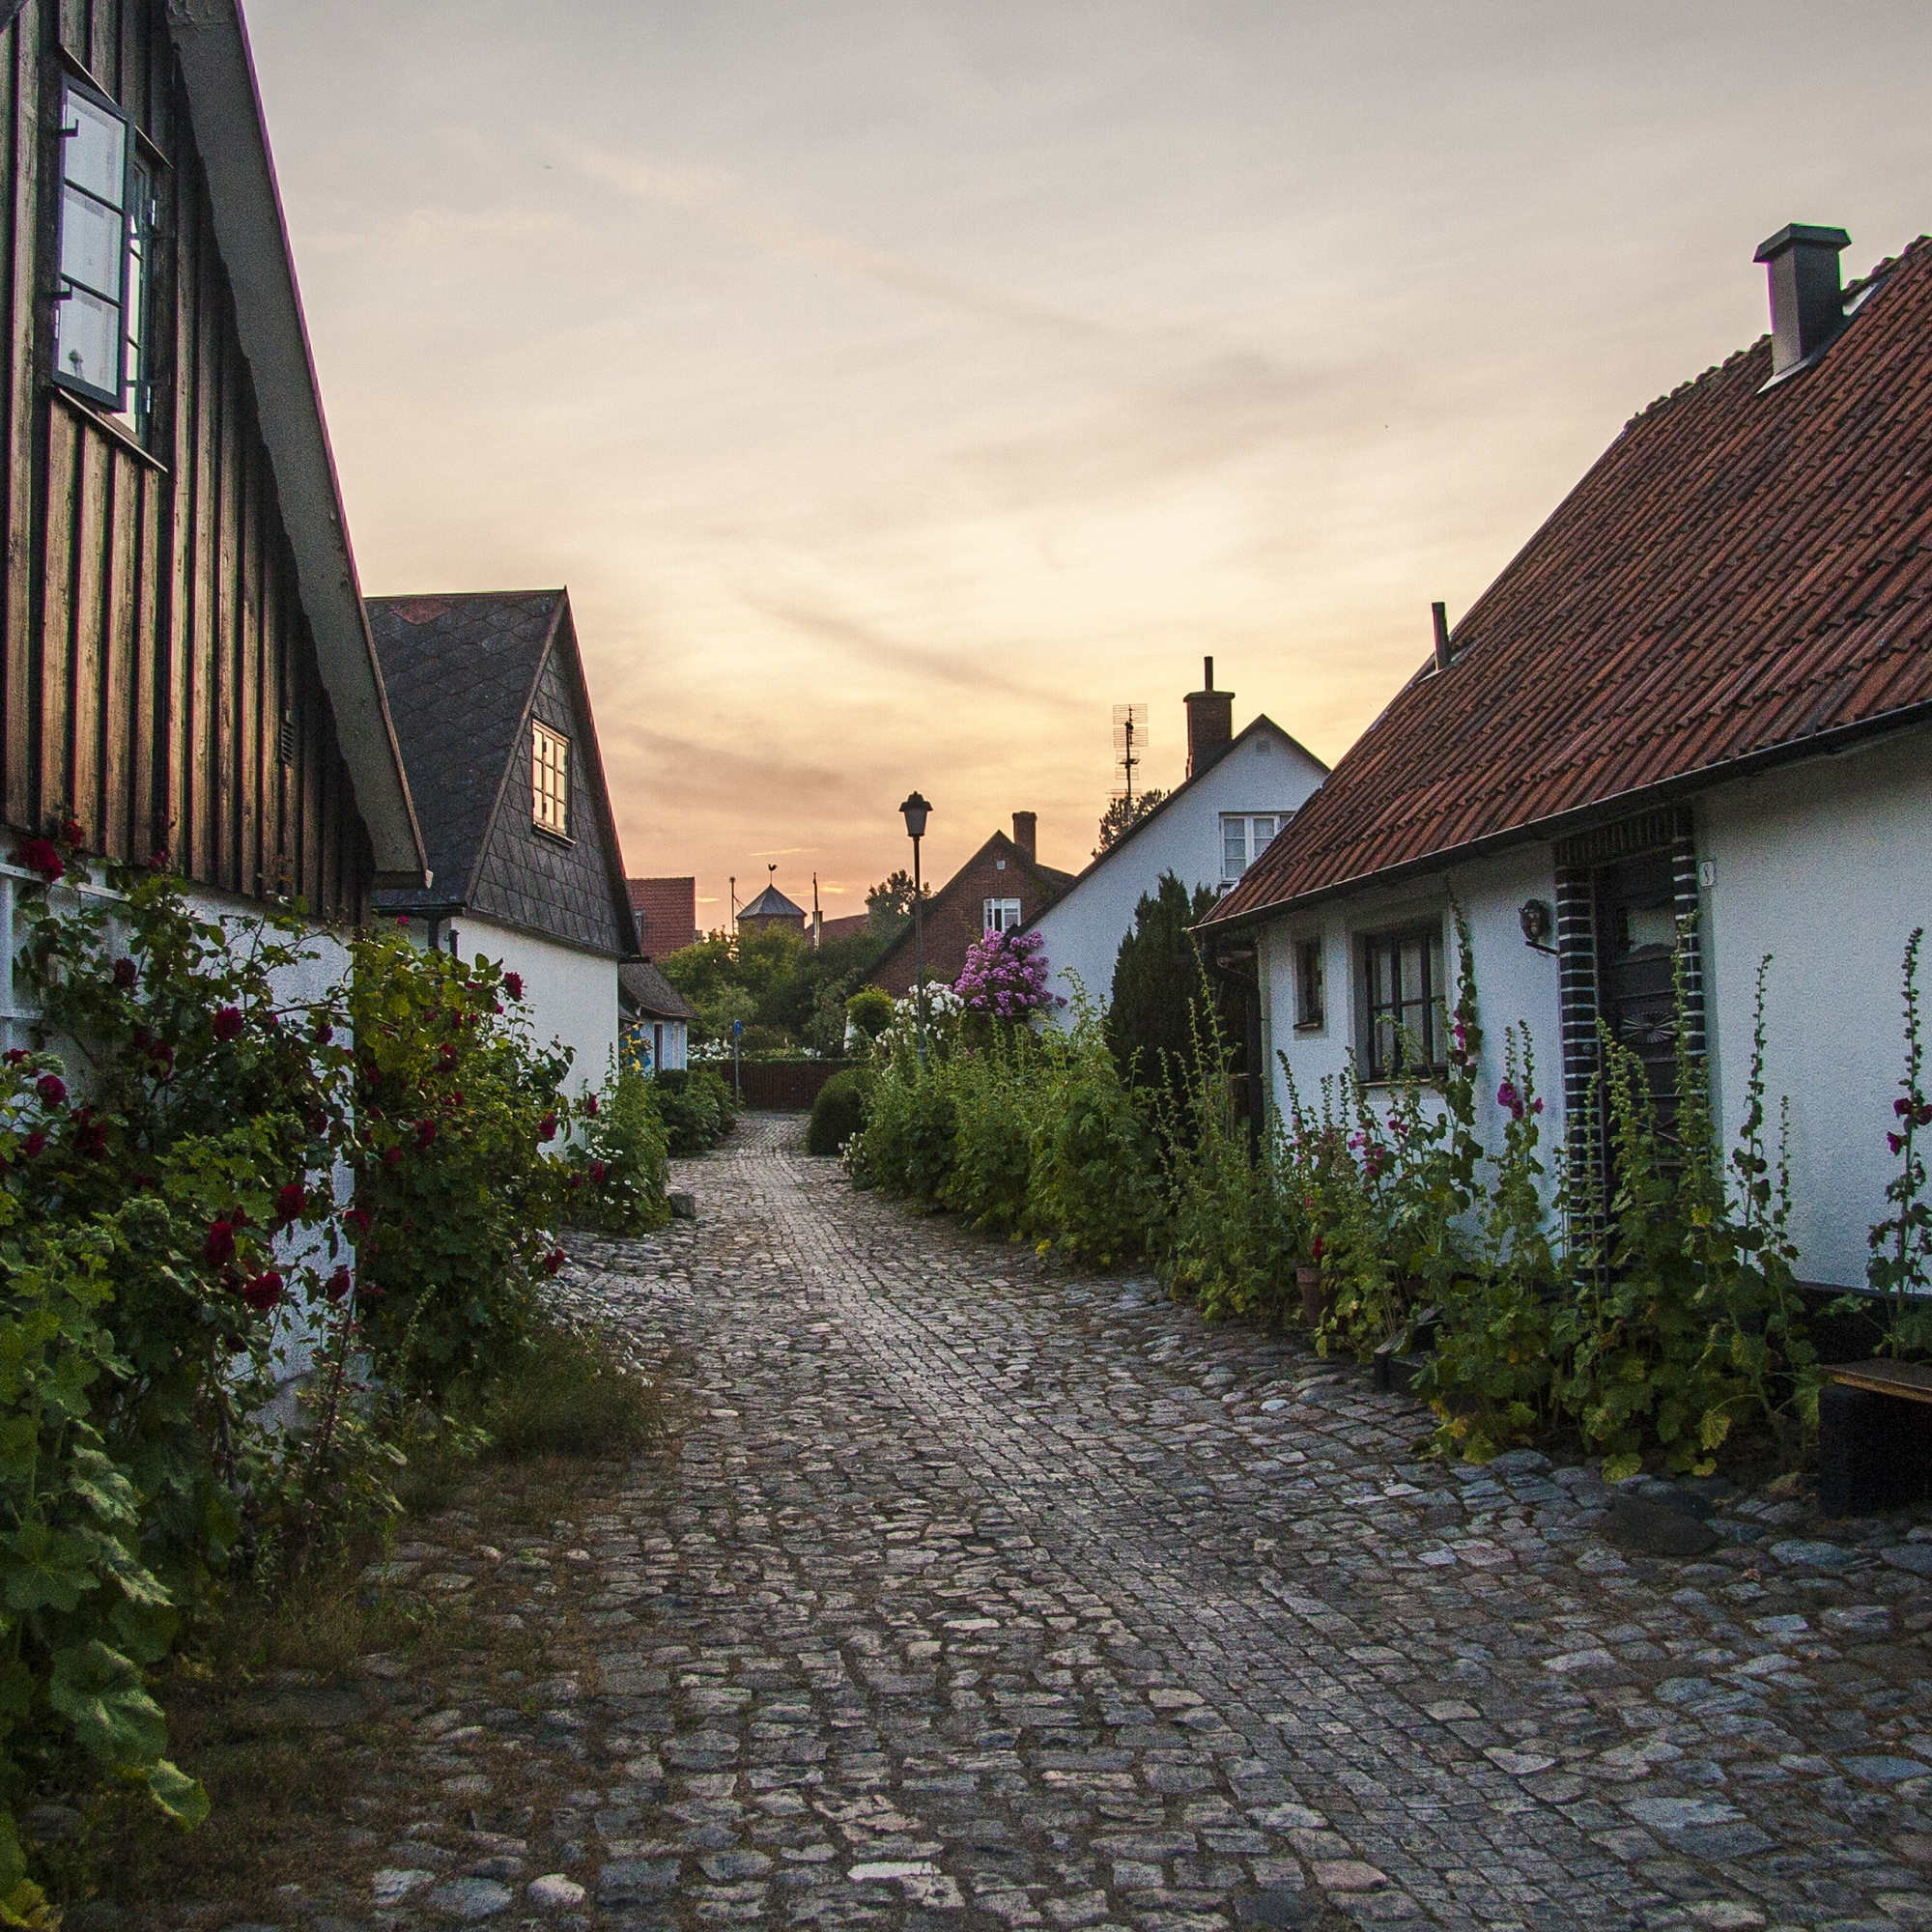 Town of Skillinge in Sk?ne, southern Sweden